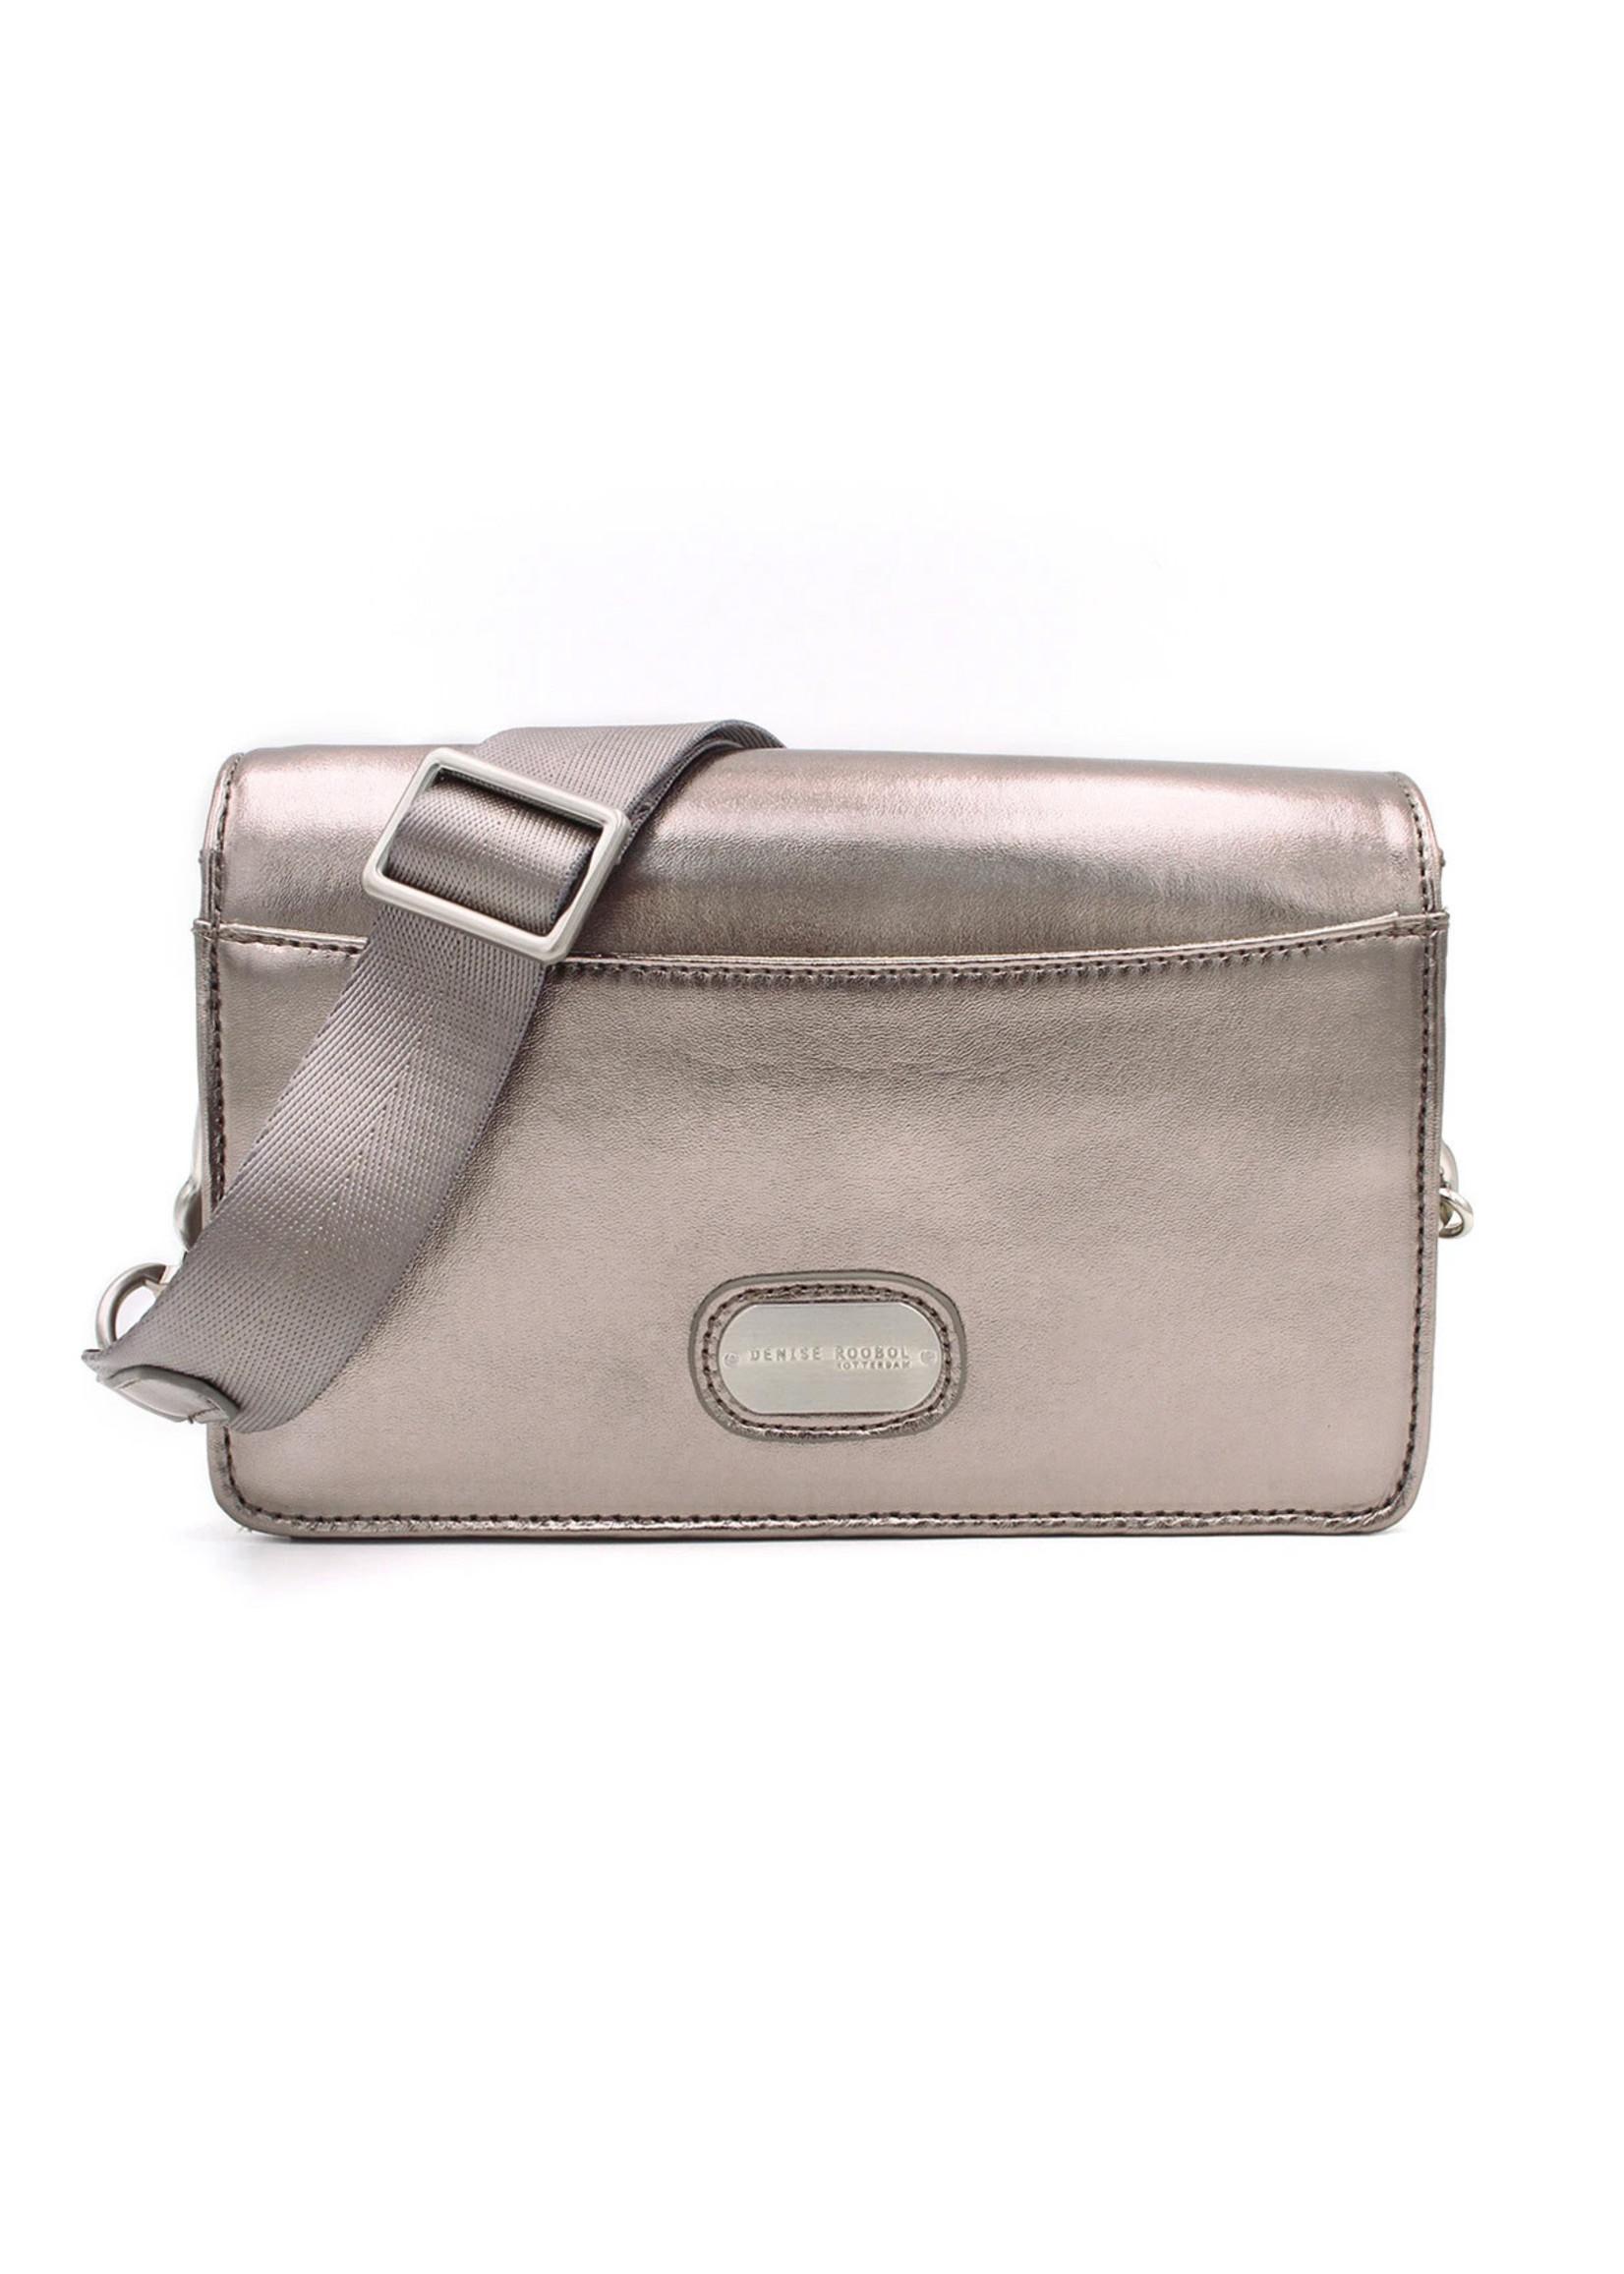 Denise Roobol Clutch Bag Metallic